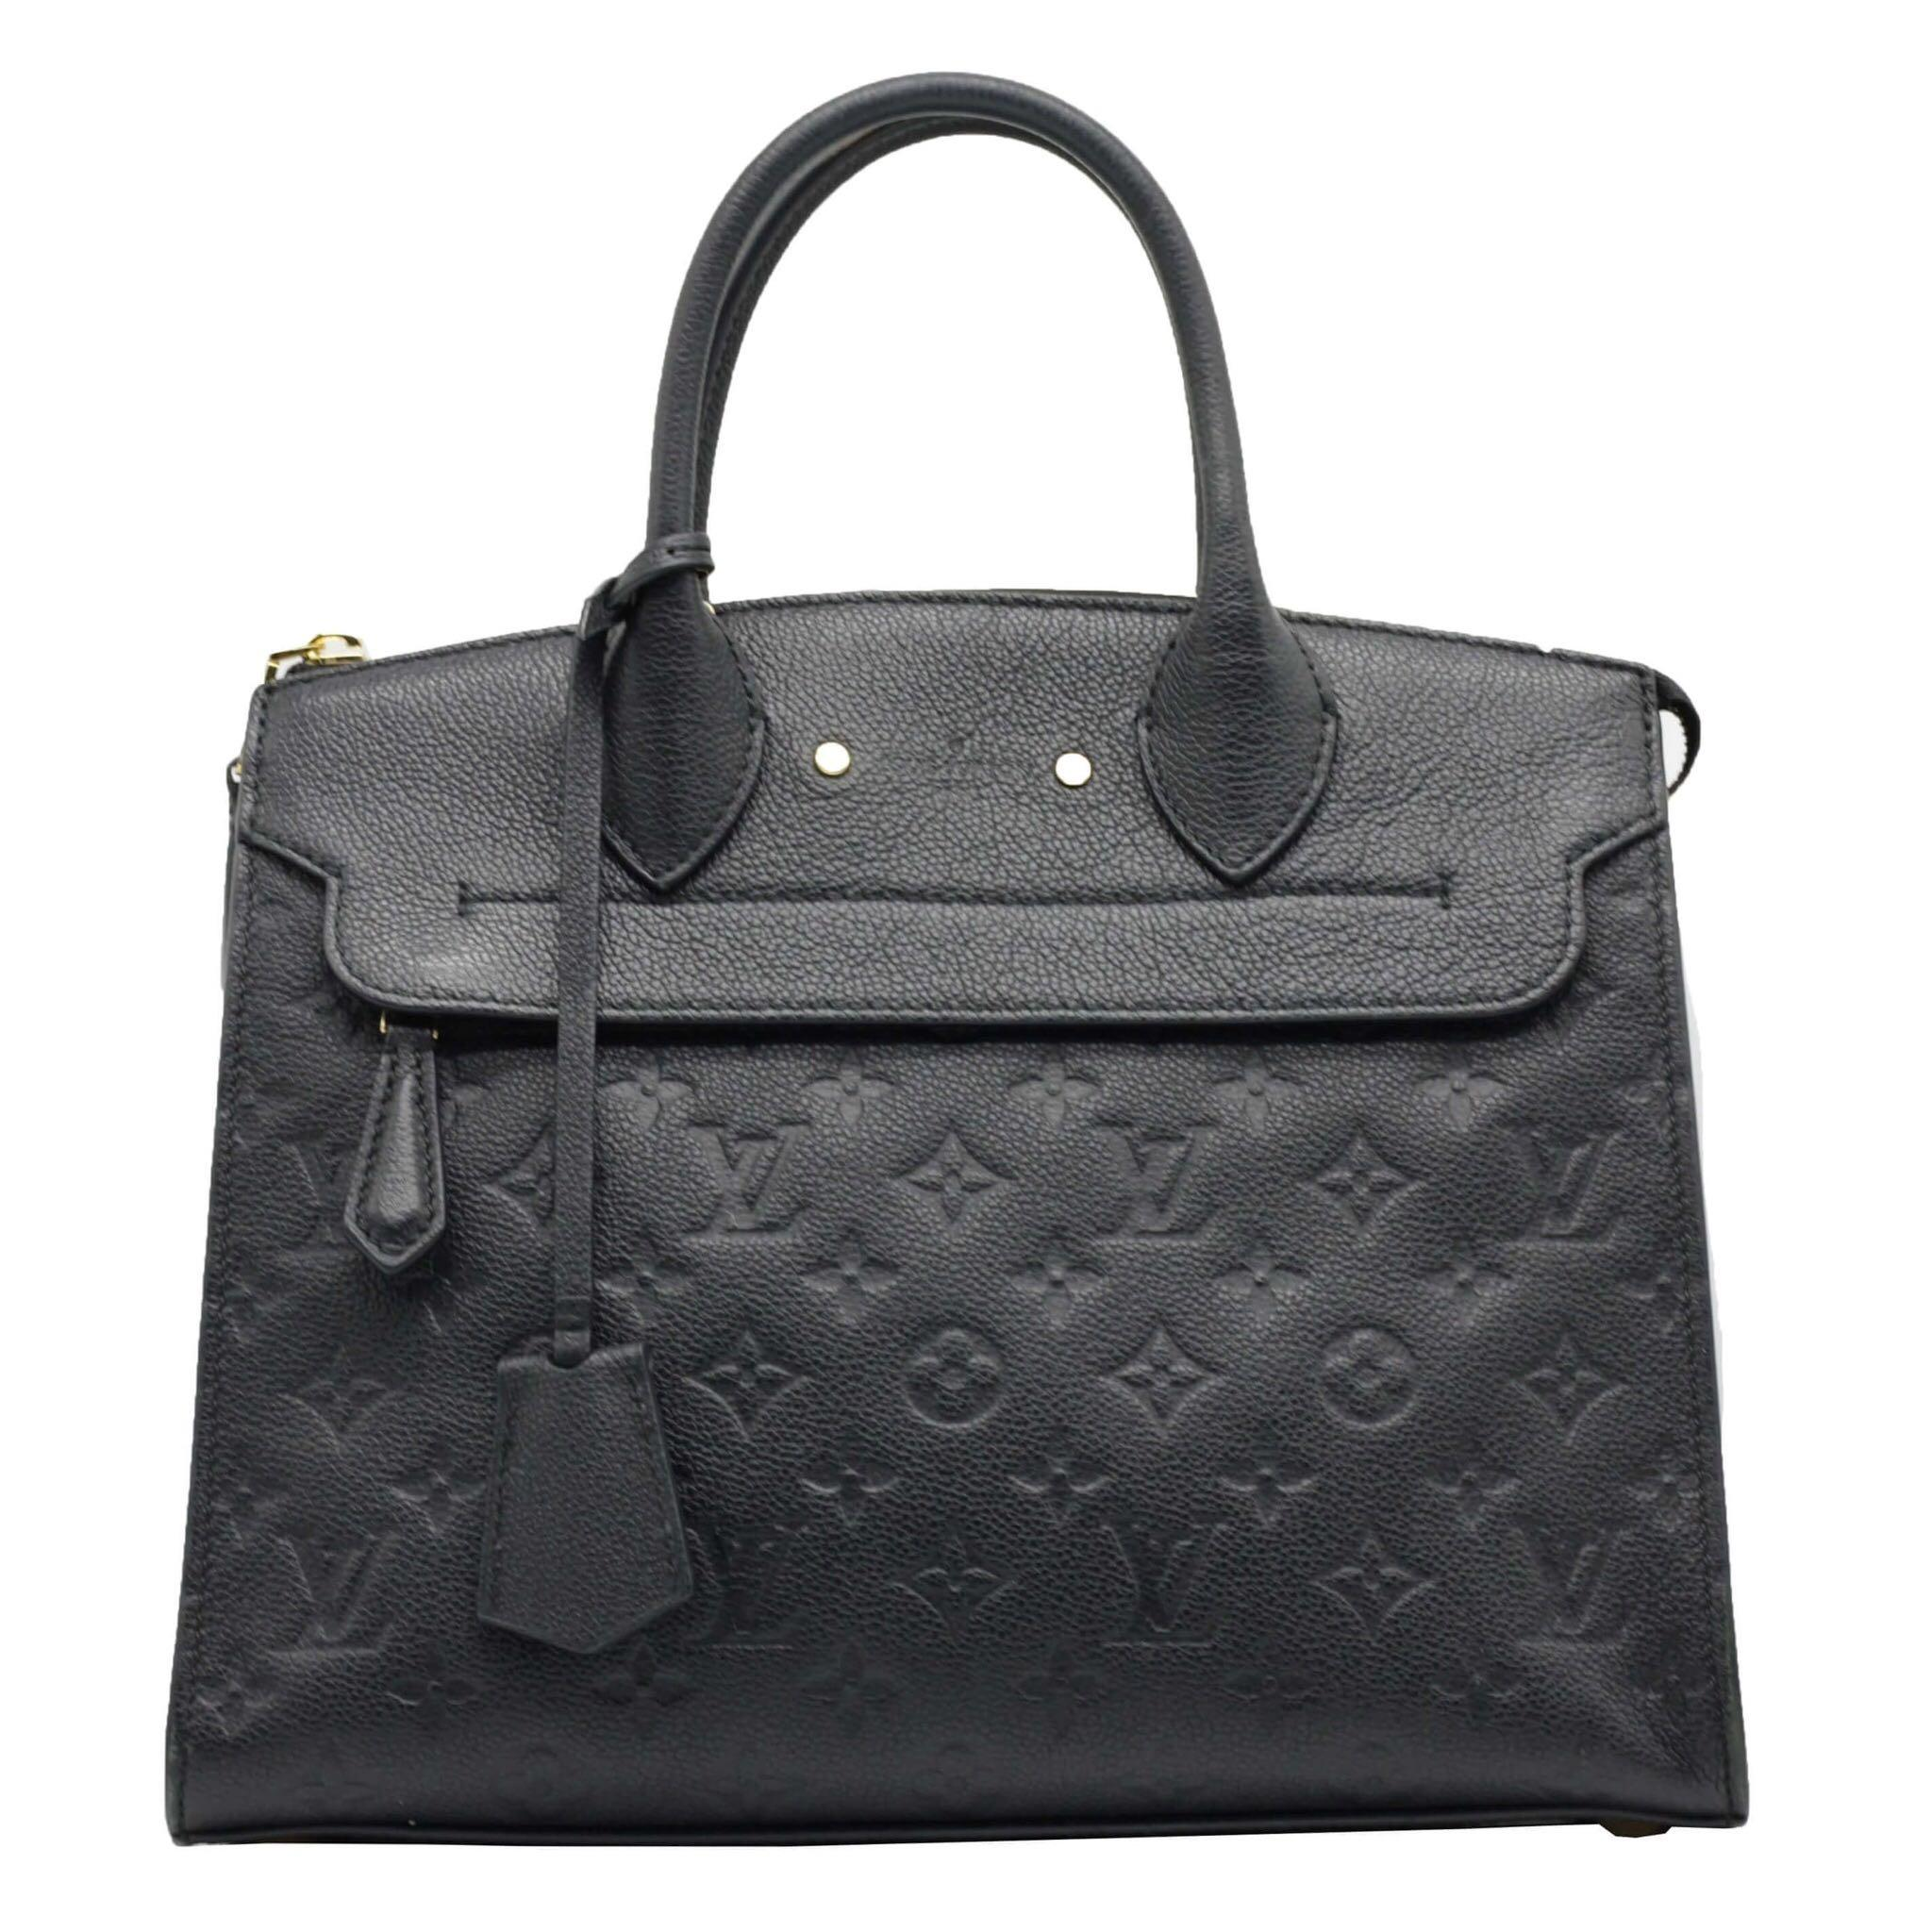 LOUIS VUITTON Monogram Empreinte Leather Pont Neuf MM Bag